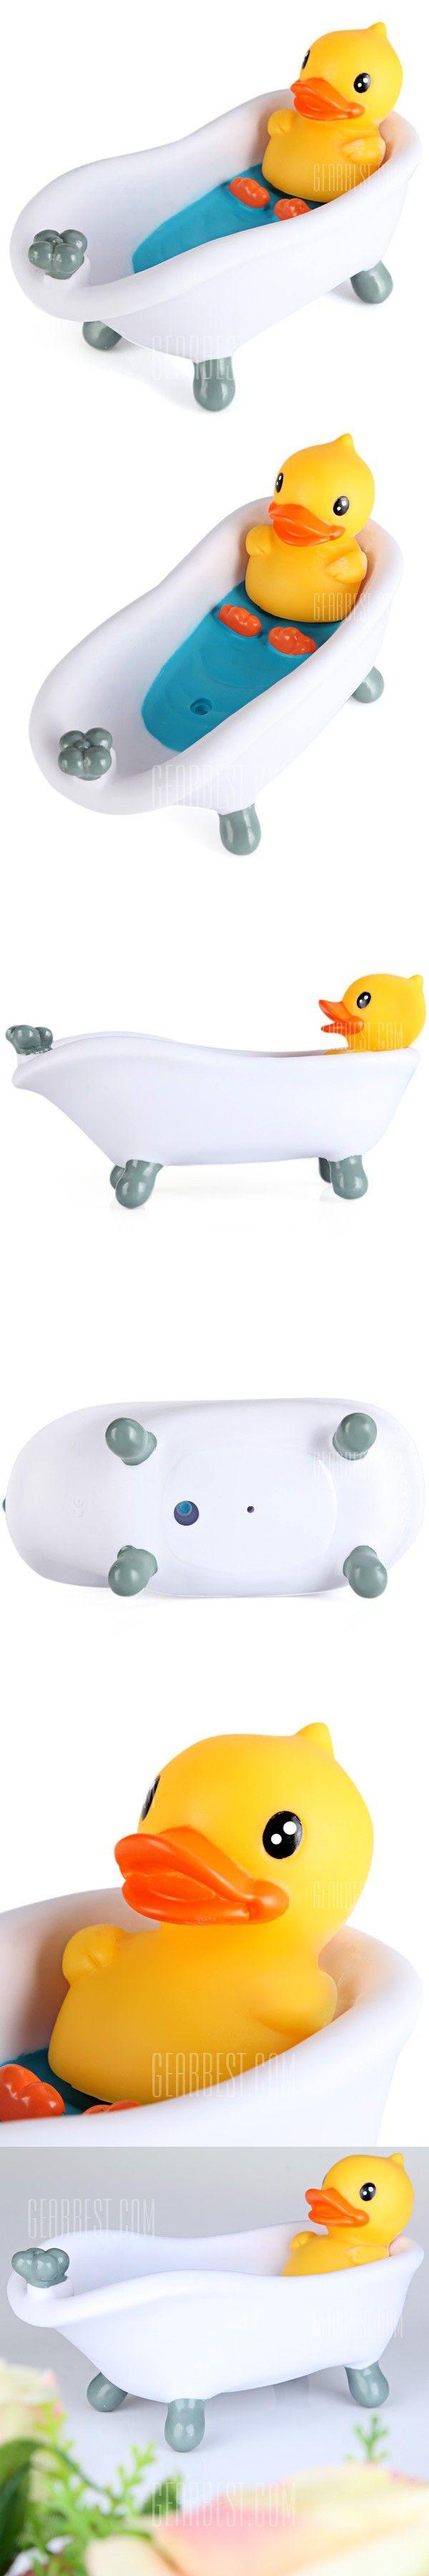 Bath toy storage that transforms to guest luxury bathroom on - Durable B Duck Bathtub Storage Box Pvc Soap Dish For Household Use